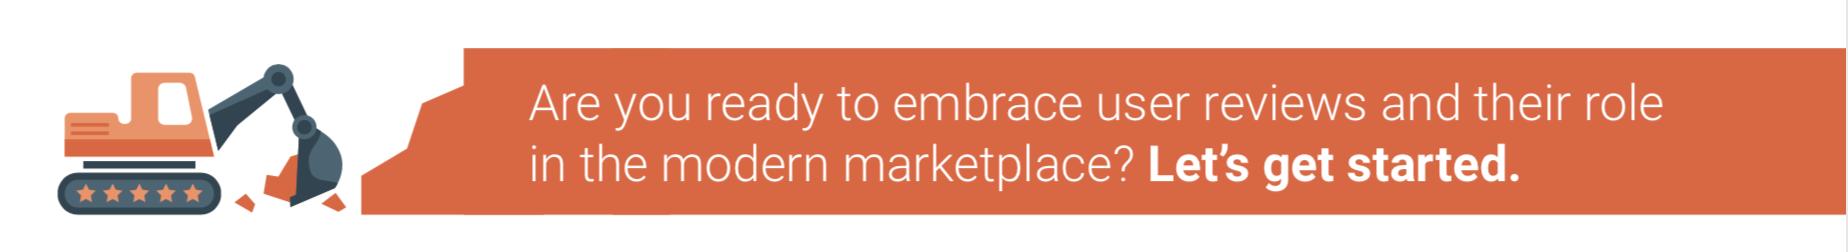 customer-reviews-strategy